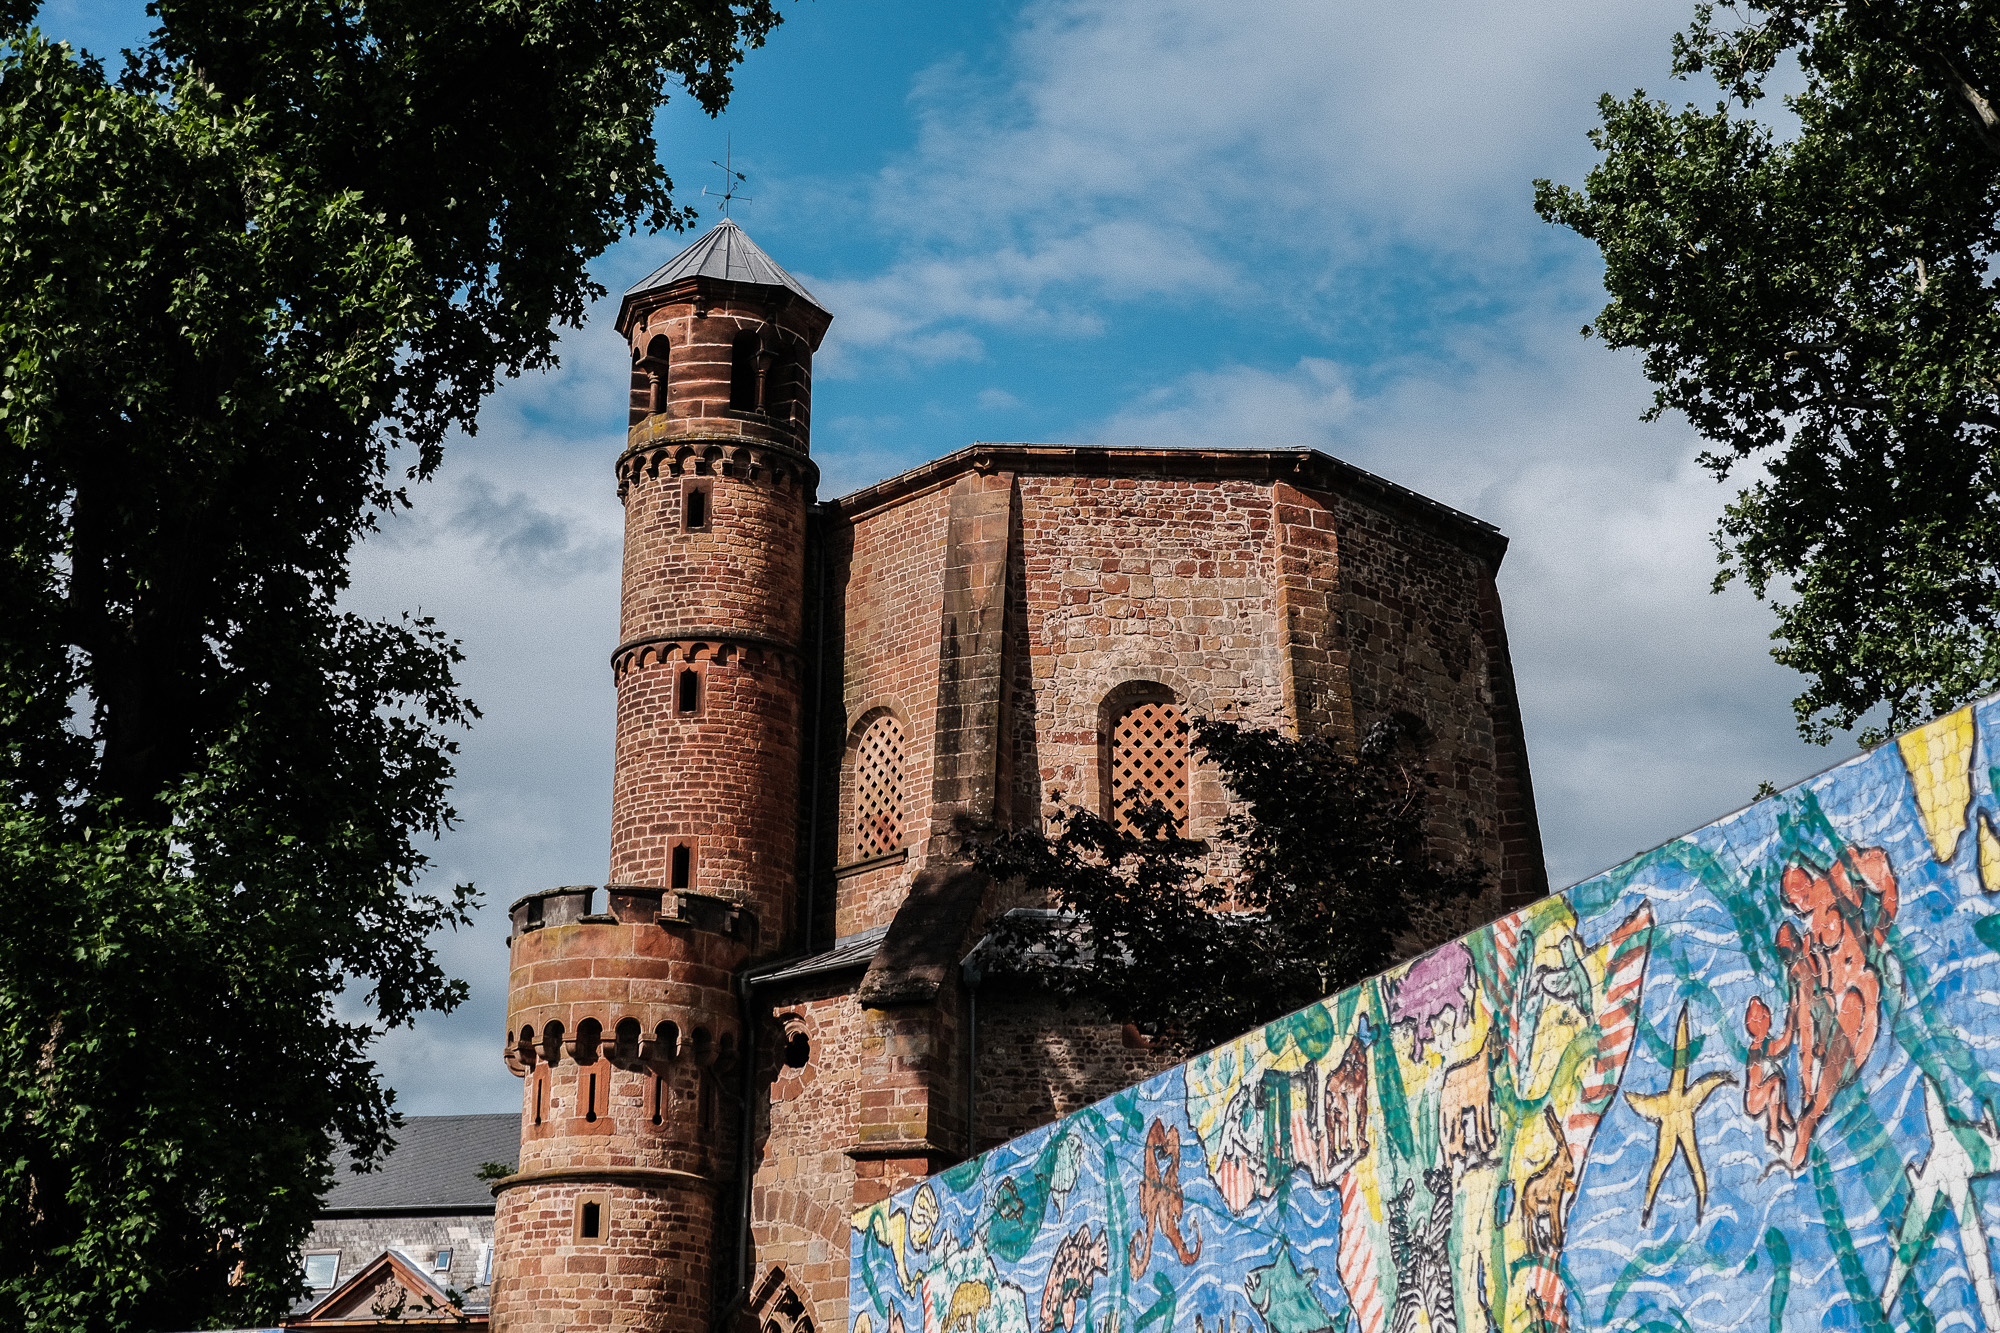 Mettlach alter Turm